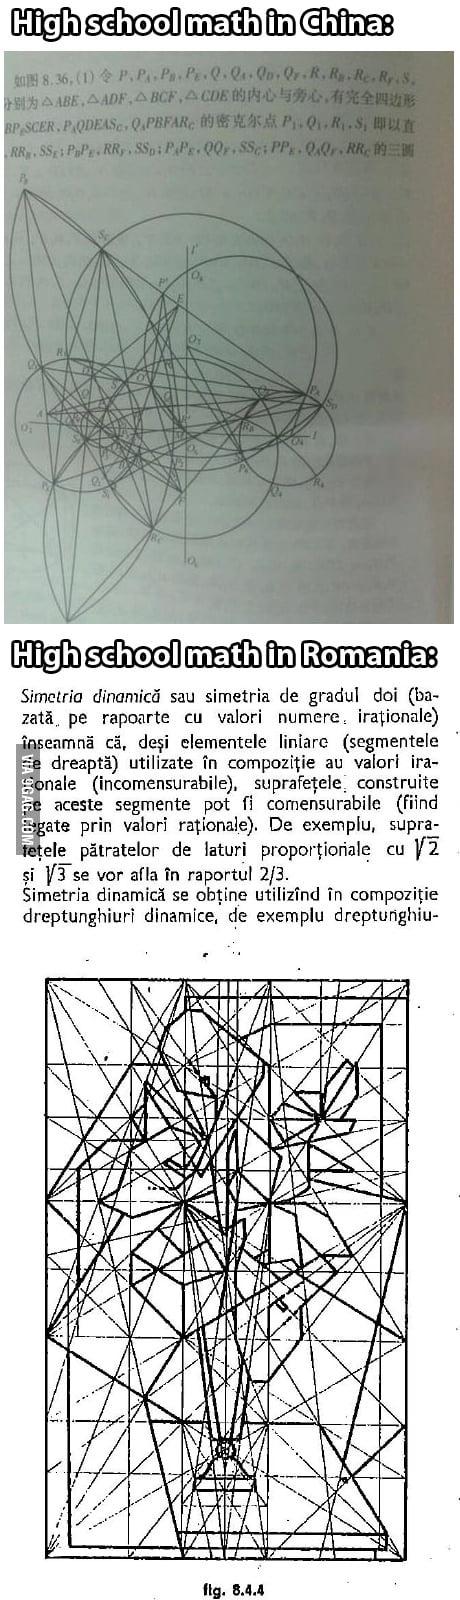 I'll raise you High school math in Romania.